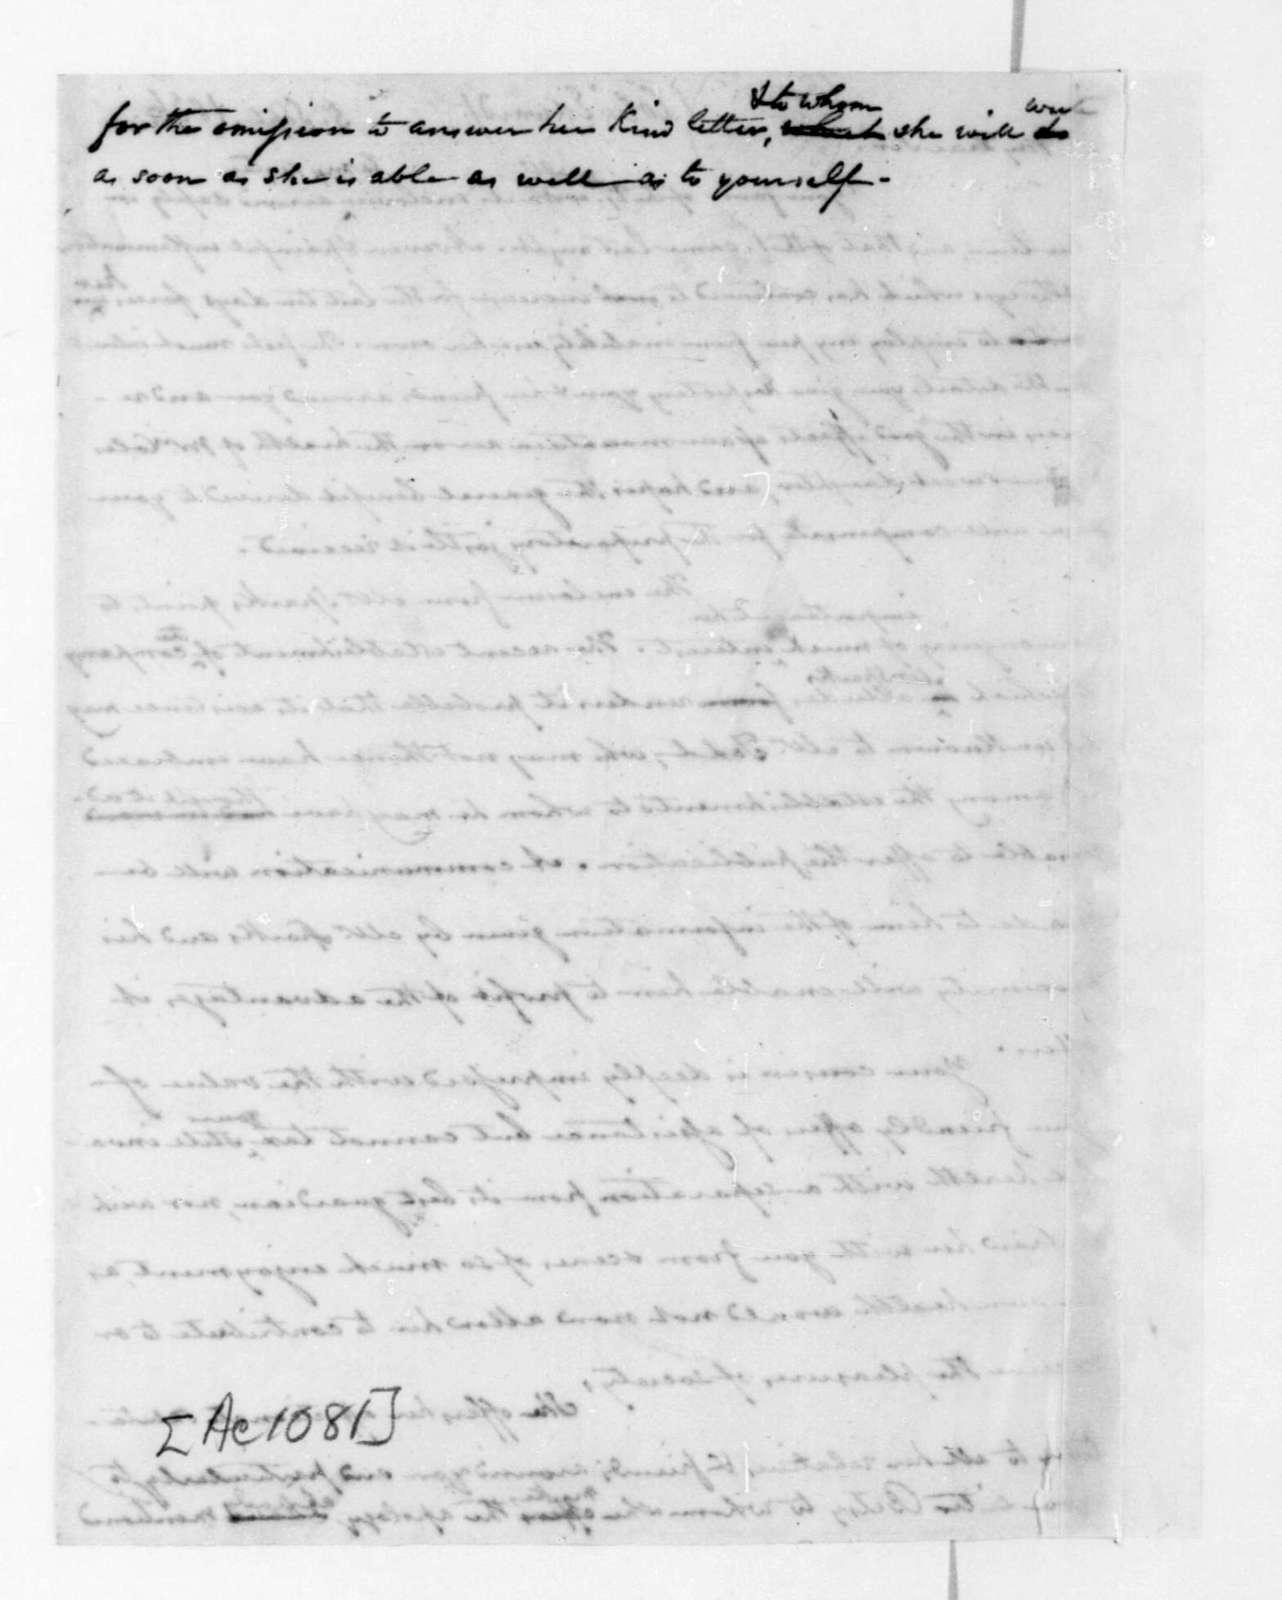 John C. Payne to Edward Coles, September 5, 1836.